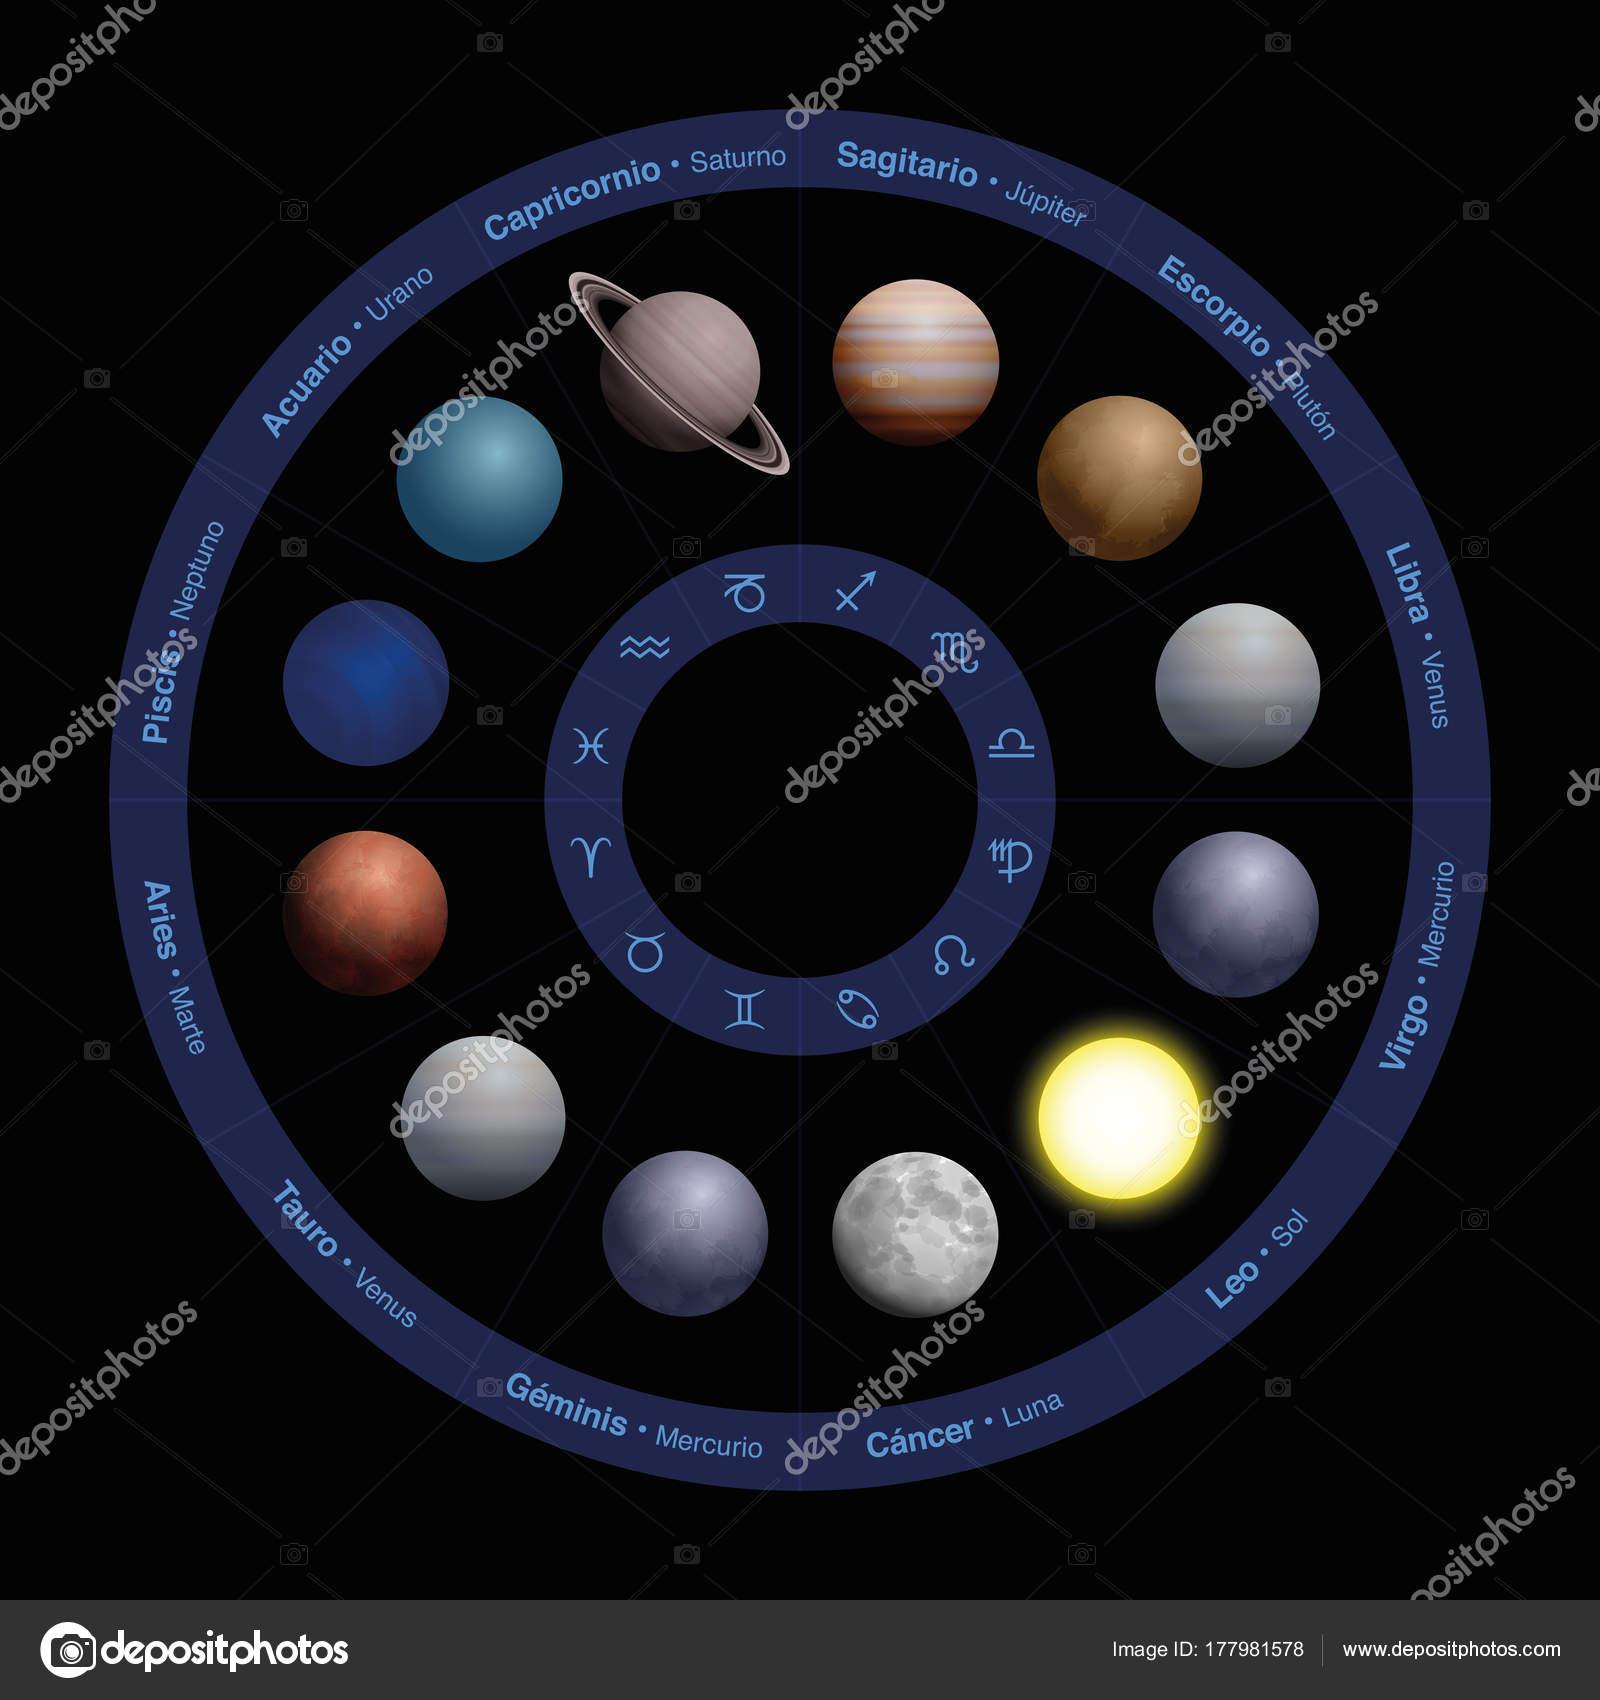 Planets Astrology Spanish Names Zodiac Circle Stock Vector